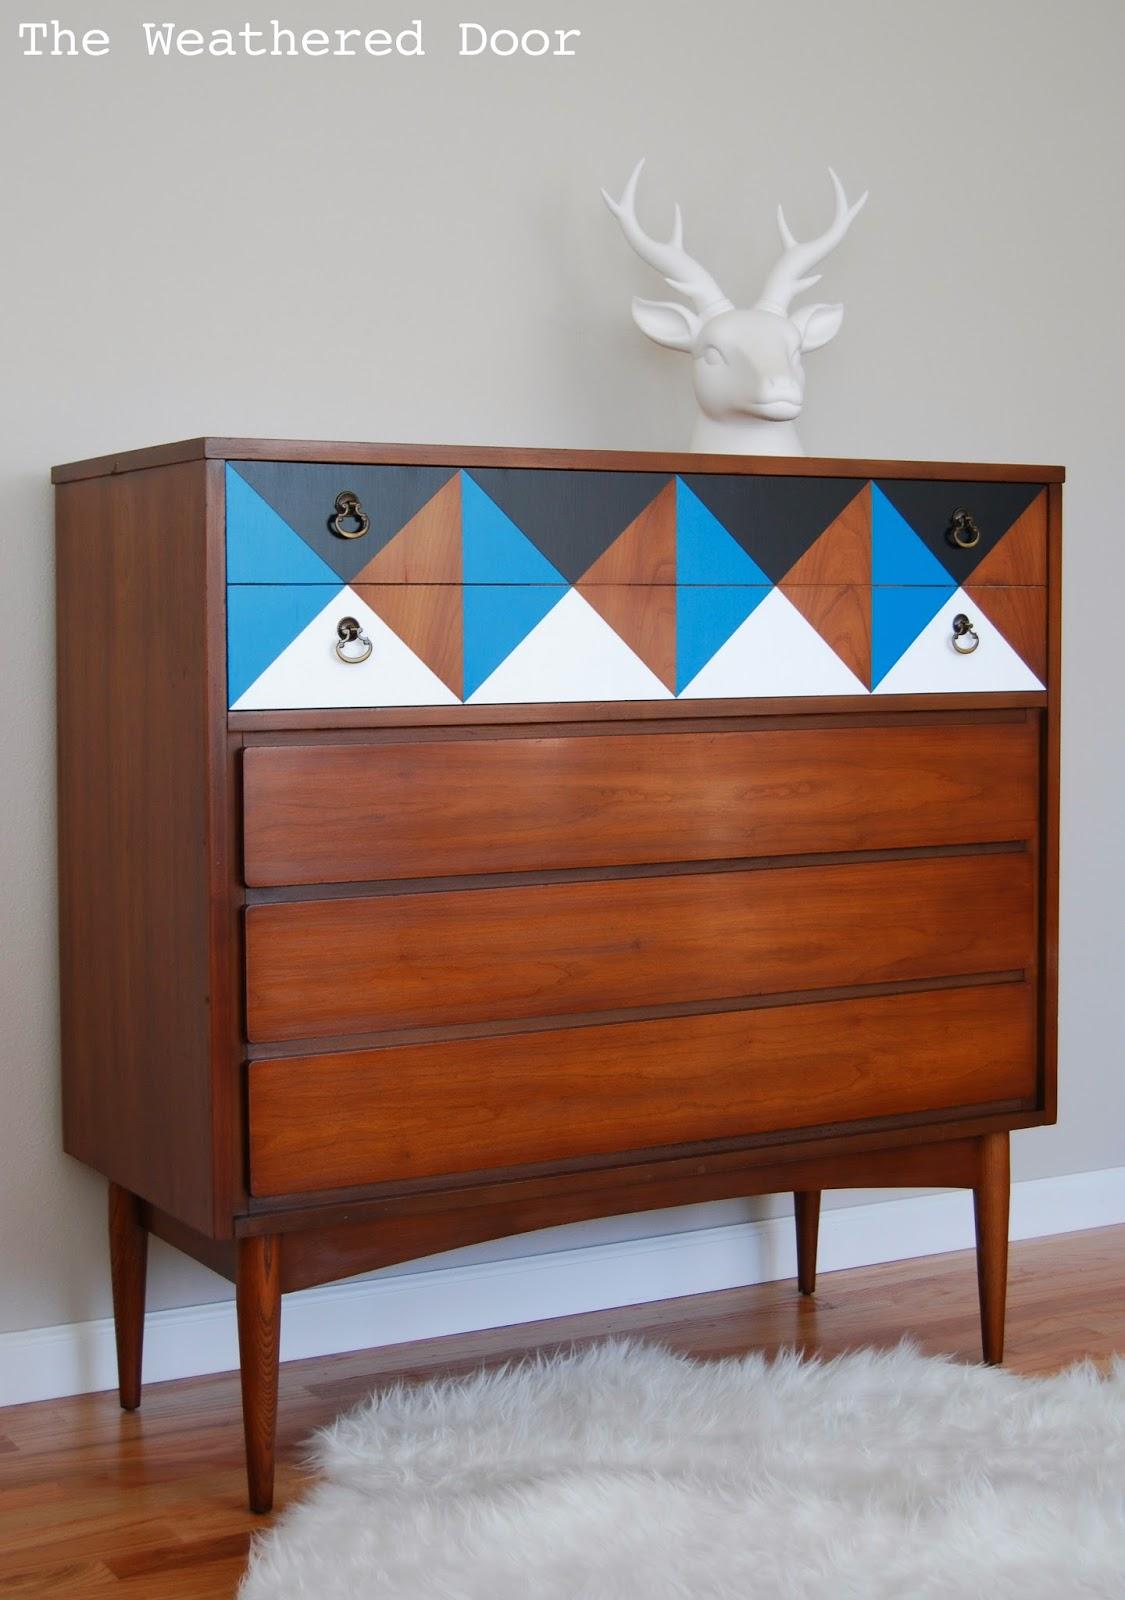 A Geometric Mid Century Dresser - The Weathered Door